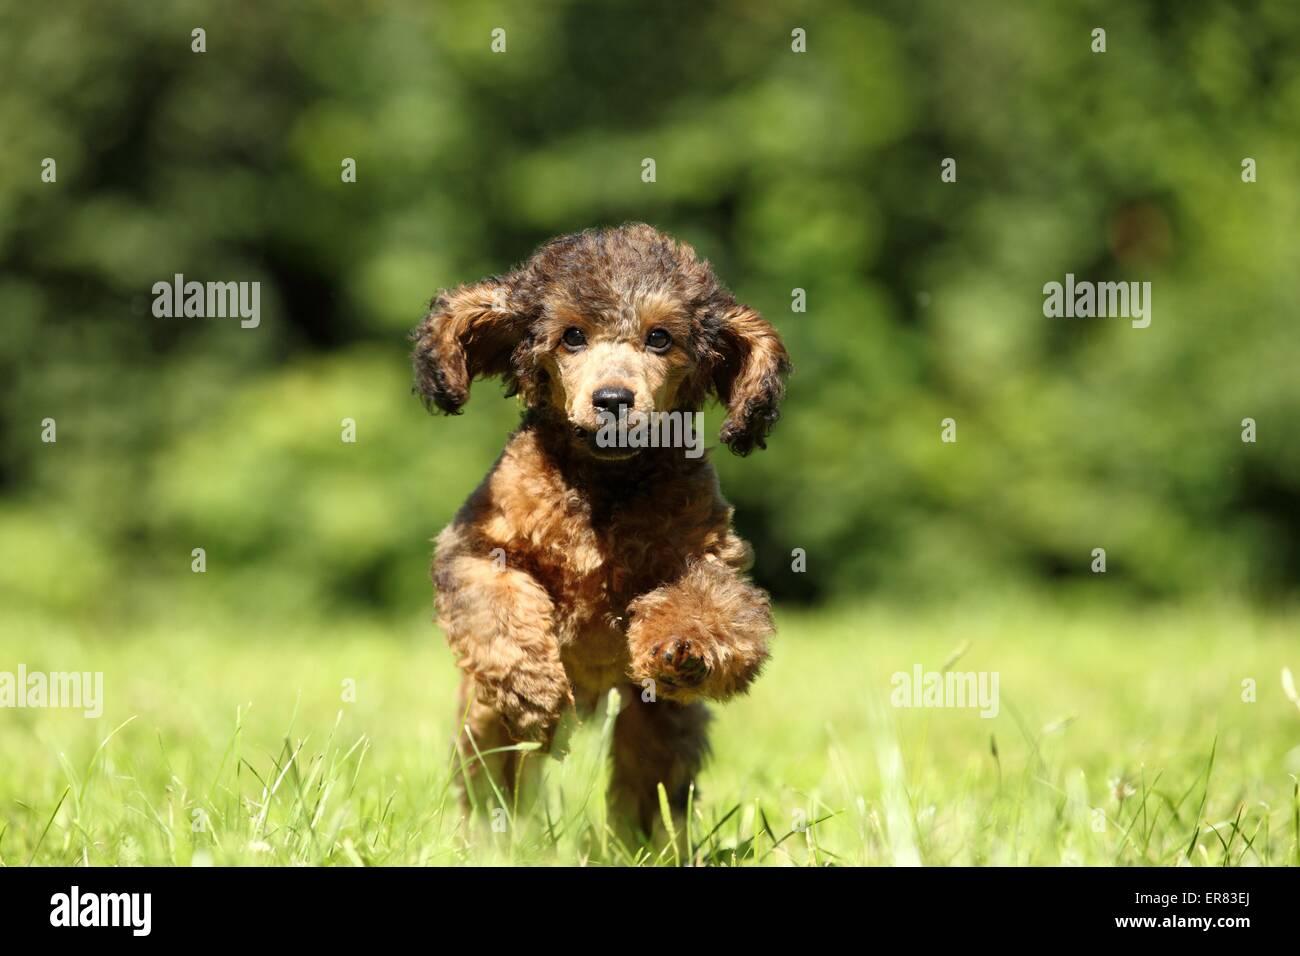 Miniature Poodle Puppy - Stock Image